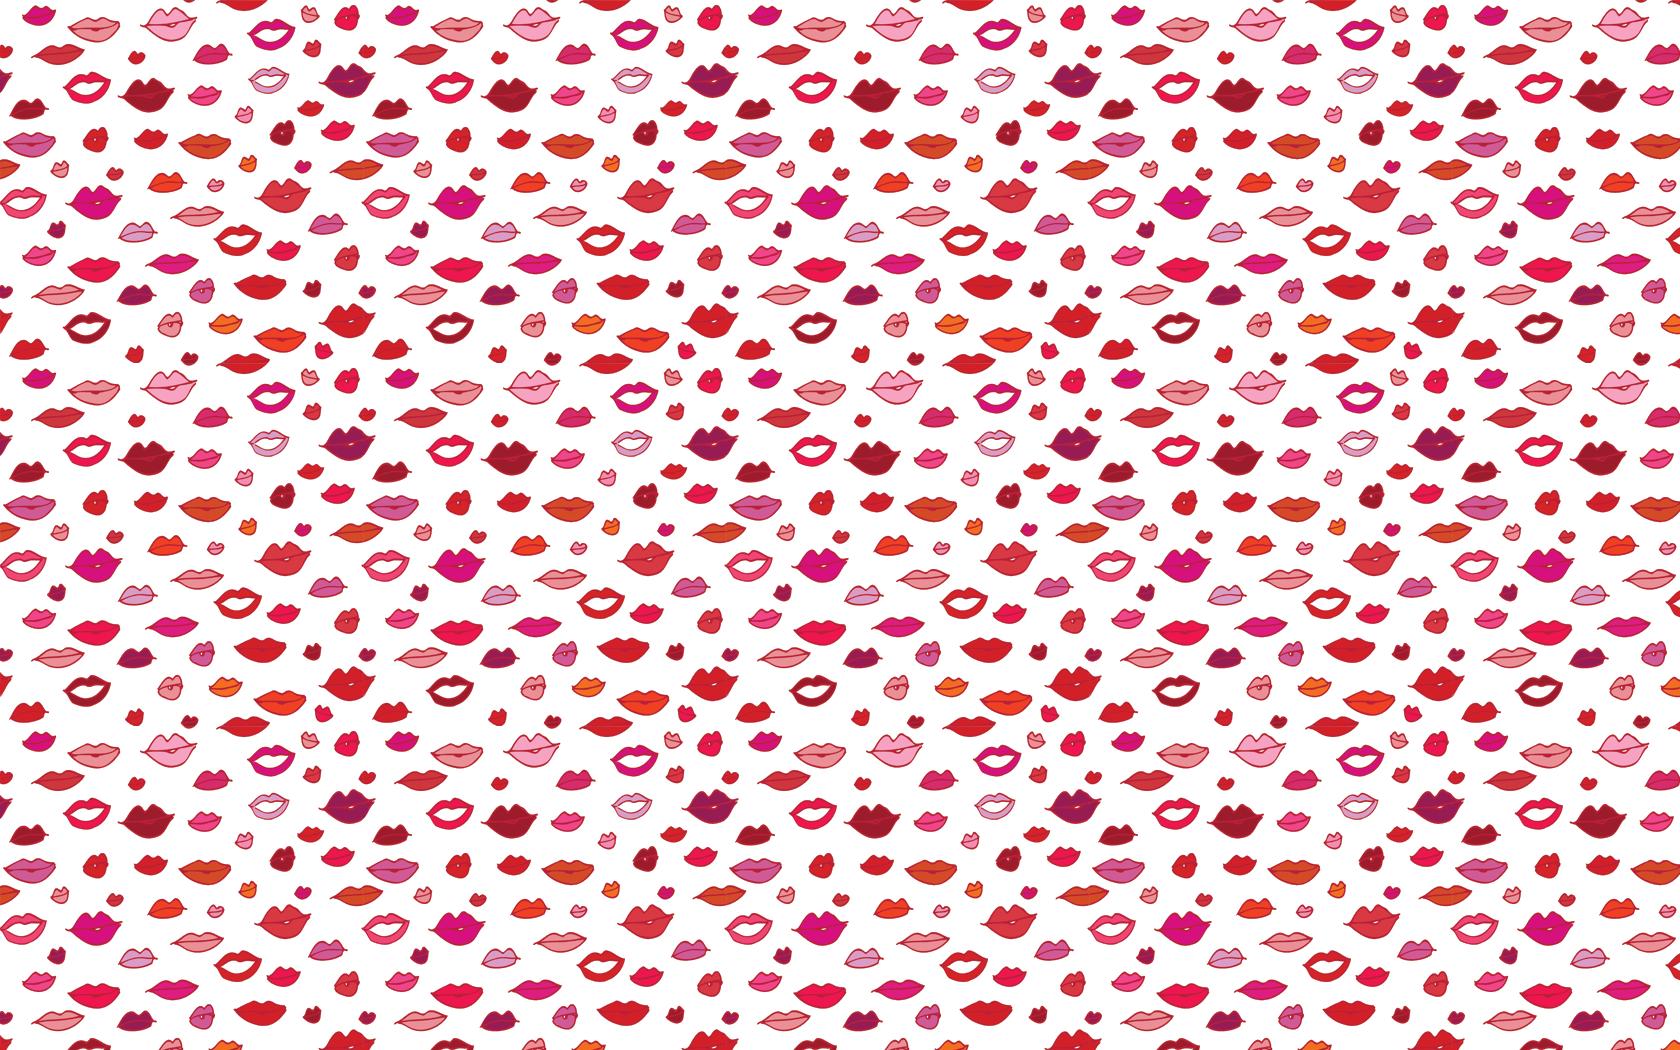 pc wallpaper lips 1680x1050